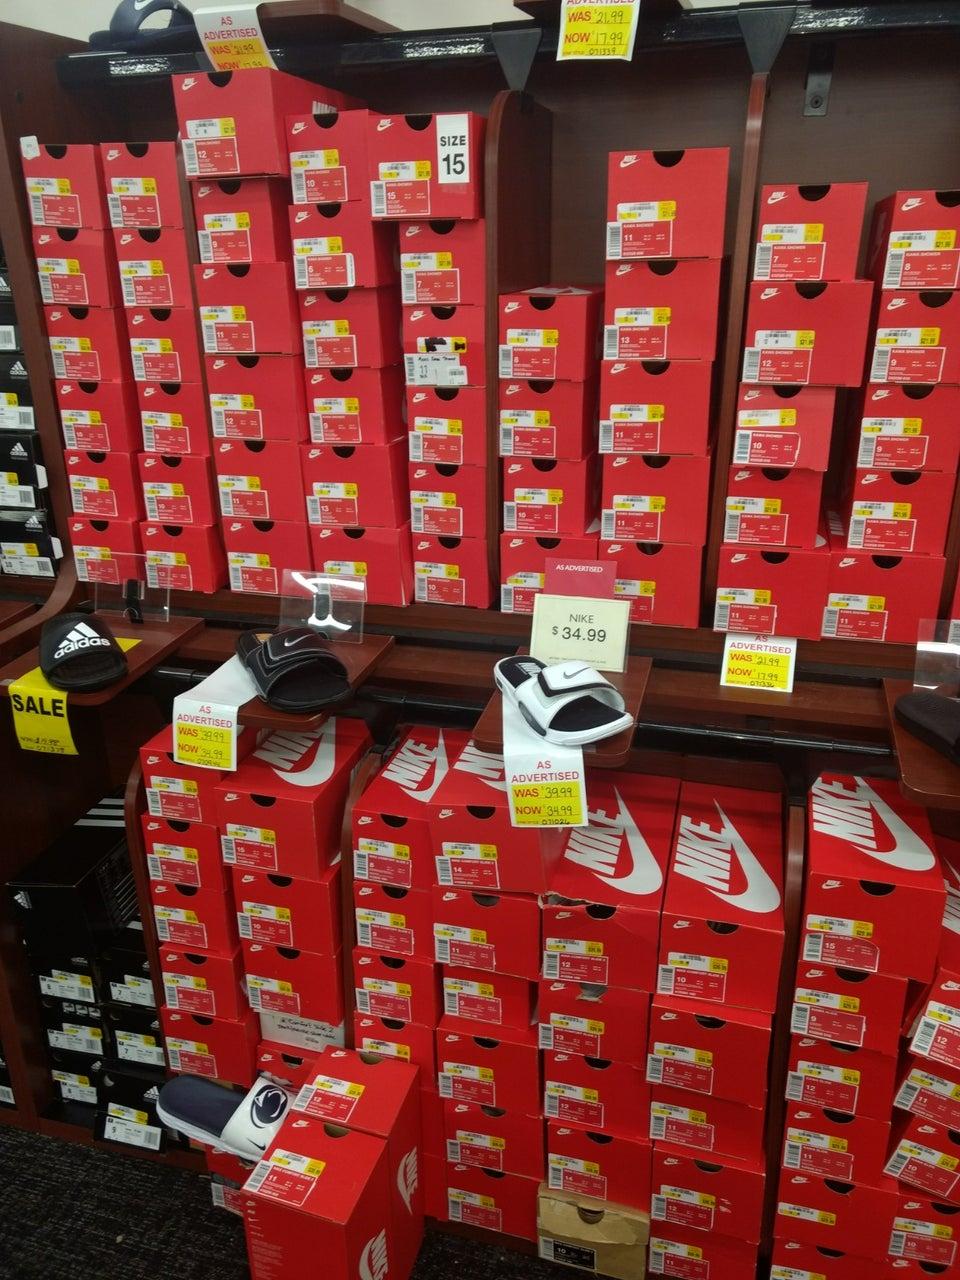 Shoe Show 633 Millcreek Mall Box 102, Erie